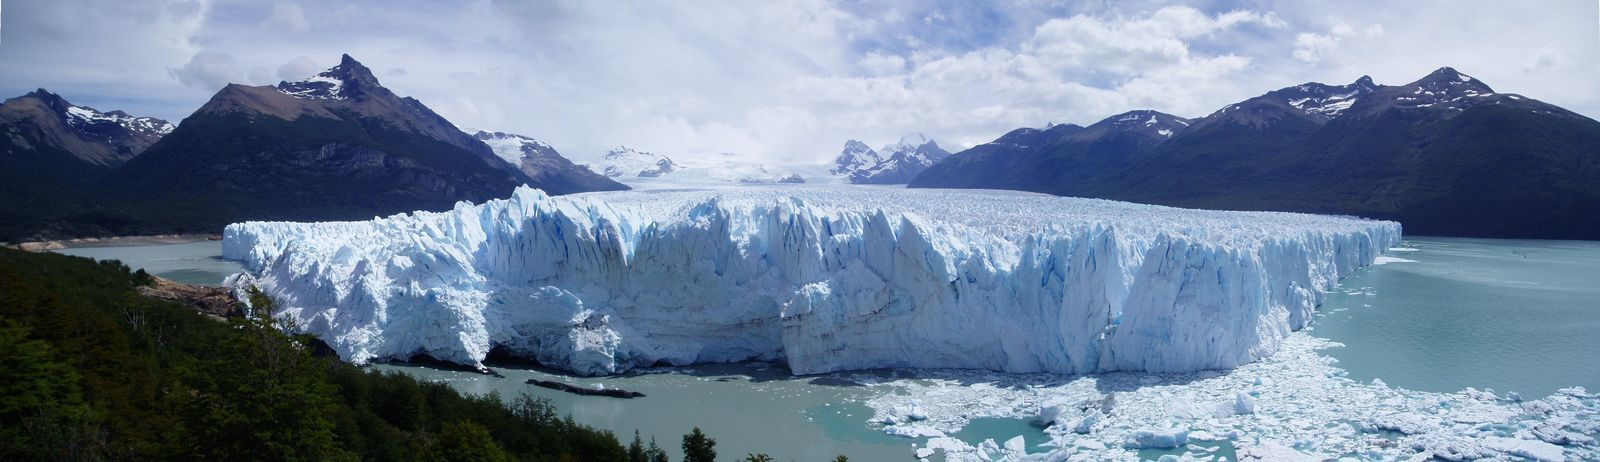 les glaciers des andes (puerito moreno,) et les constructions de carlos martini a bariloche